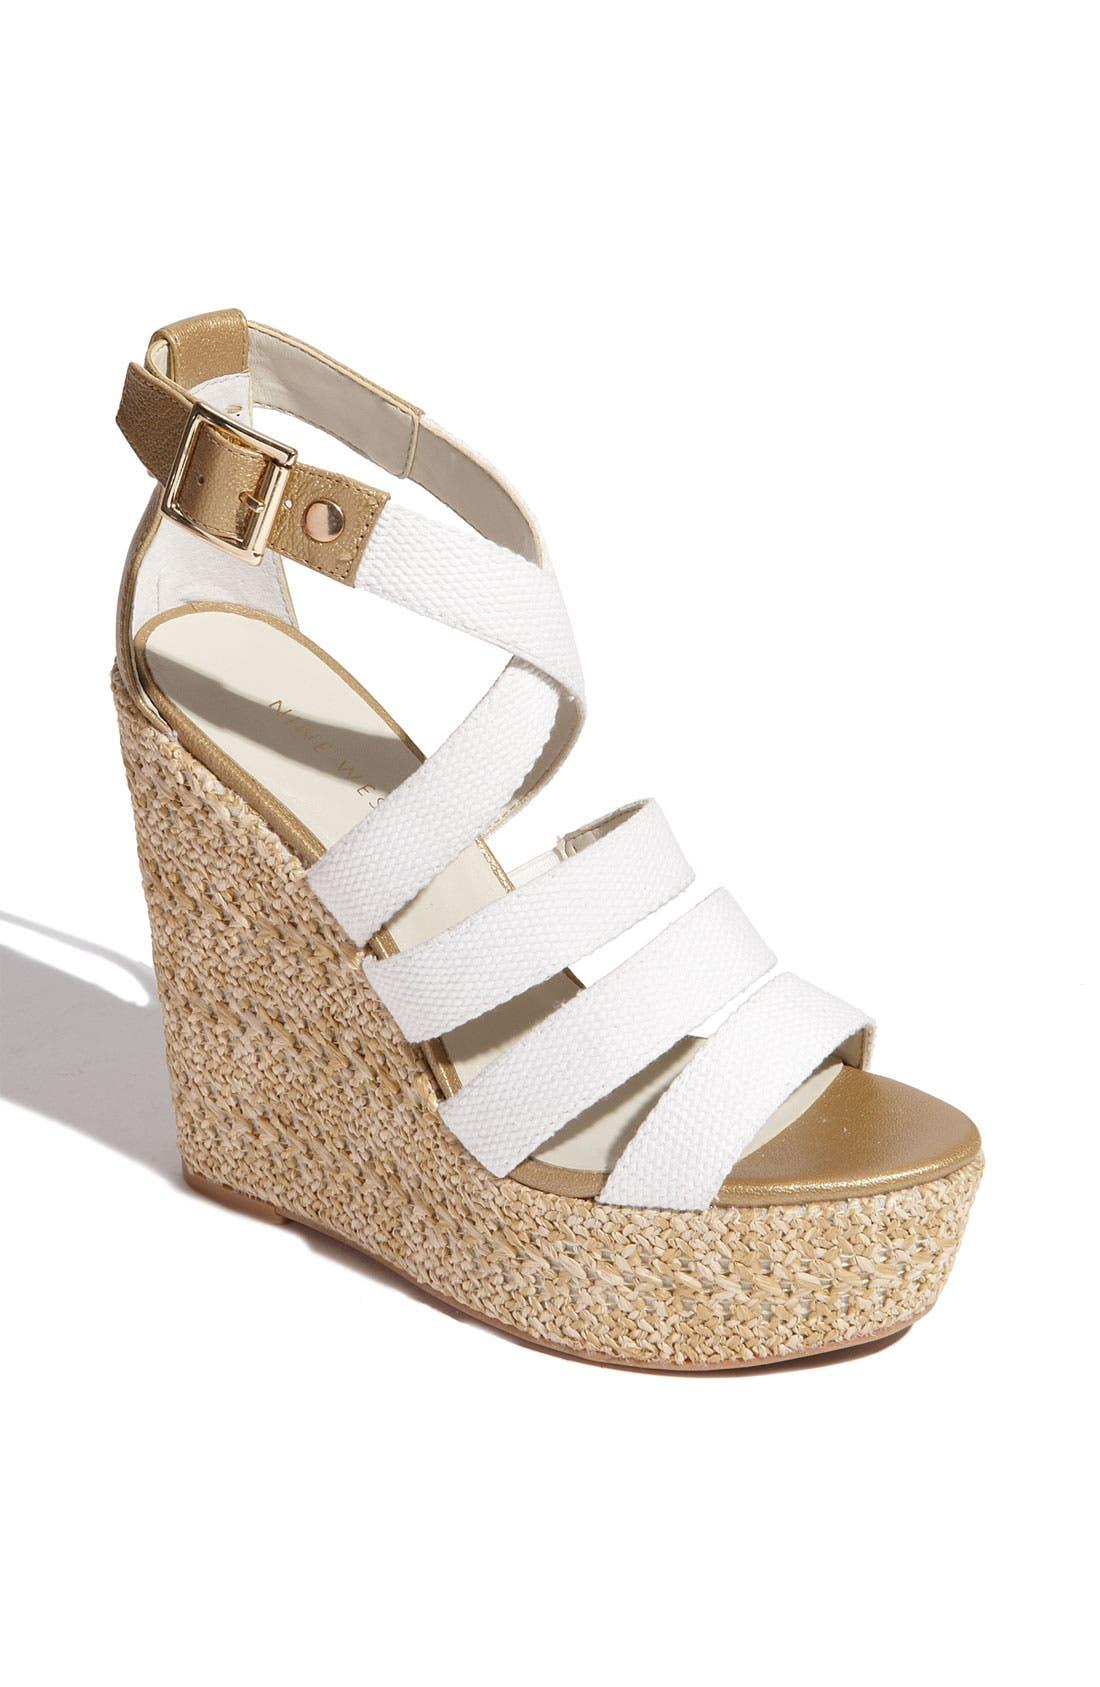 Main Image - Nine West 'Braxton' Wedge Sandal